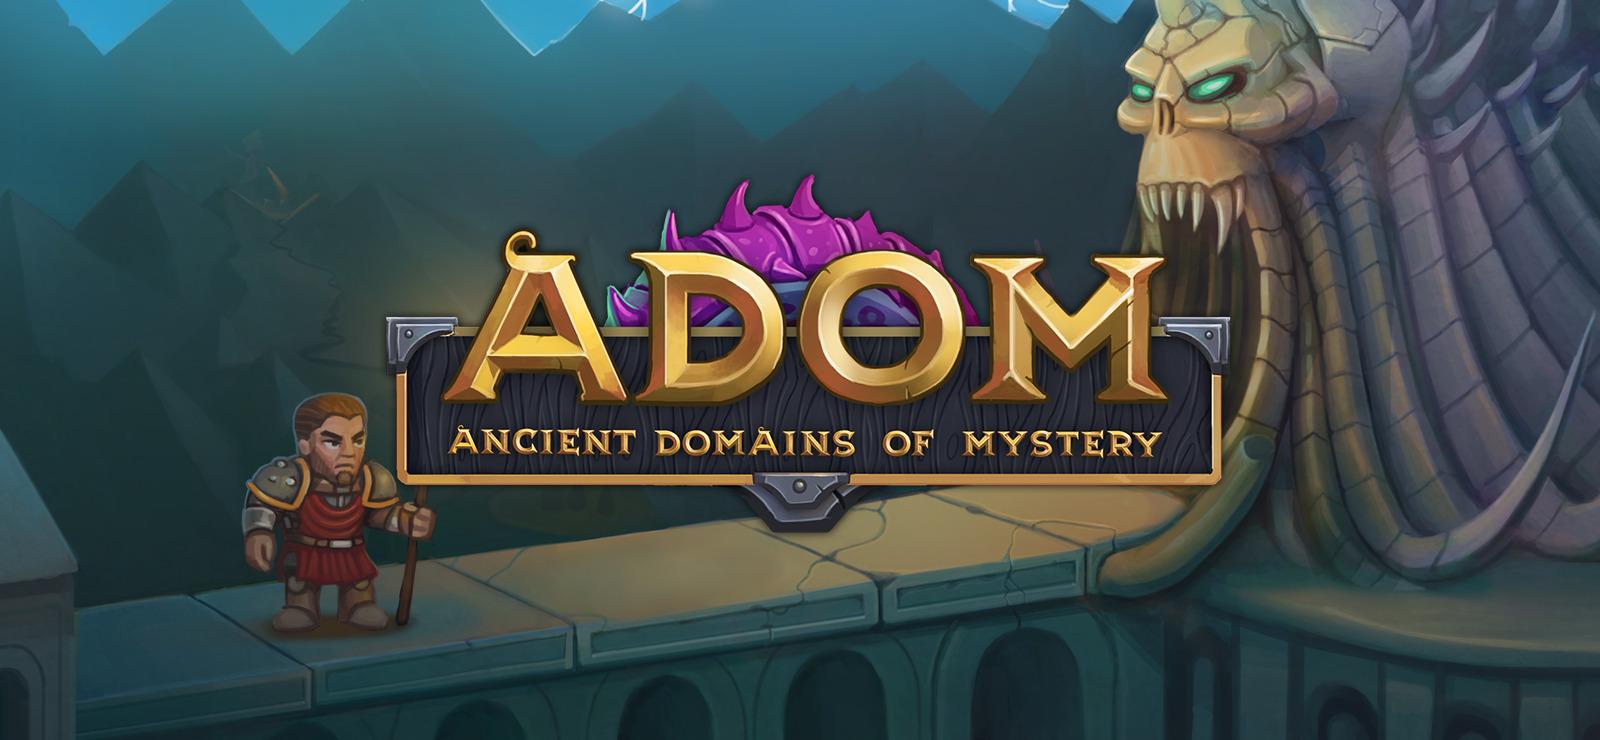 Картинки по запросу Ancient Domains of Mystery